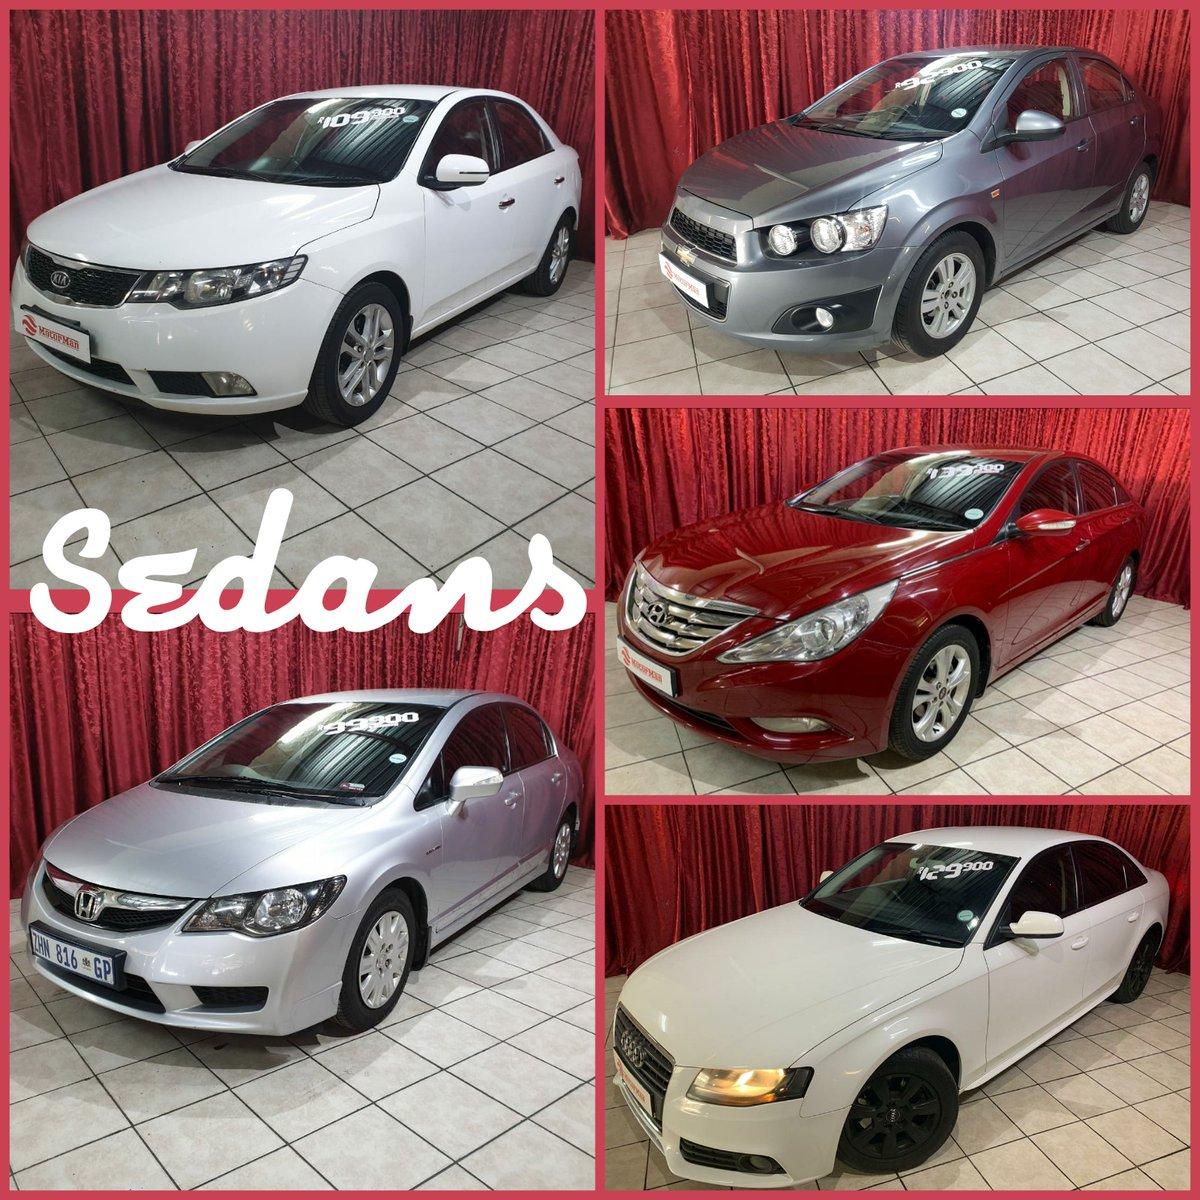 Get your family car at Motorman Nigel!   Apply Today!! Finance Available!   E and OE #tuesdayvibes #TikTok #90dayfiancetheotherway #kia #cerato #honda #civic #chevrolet #chev #sonic #hyundai #sonata #hyundaisonata #audi #audia4 #MotorMan #Nigel #DJEvolveSpeaks #familyfeudsapic.twitter.com/d1imjbc7IA